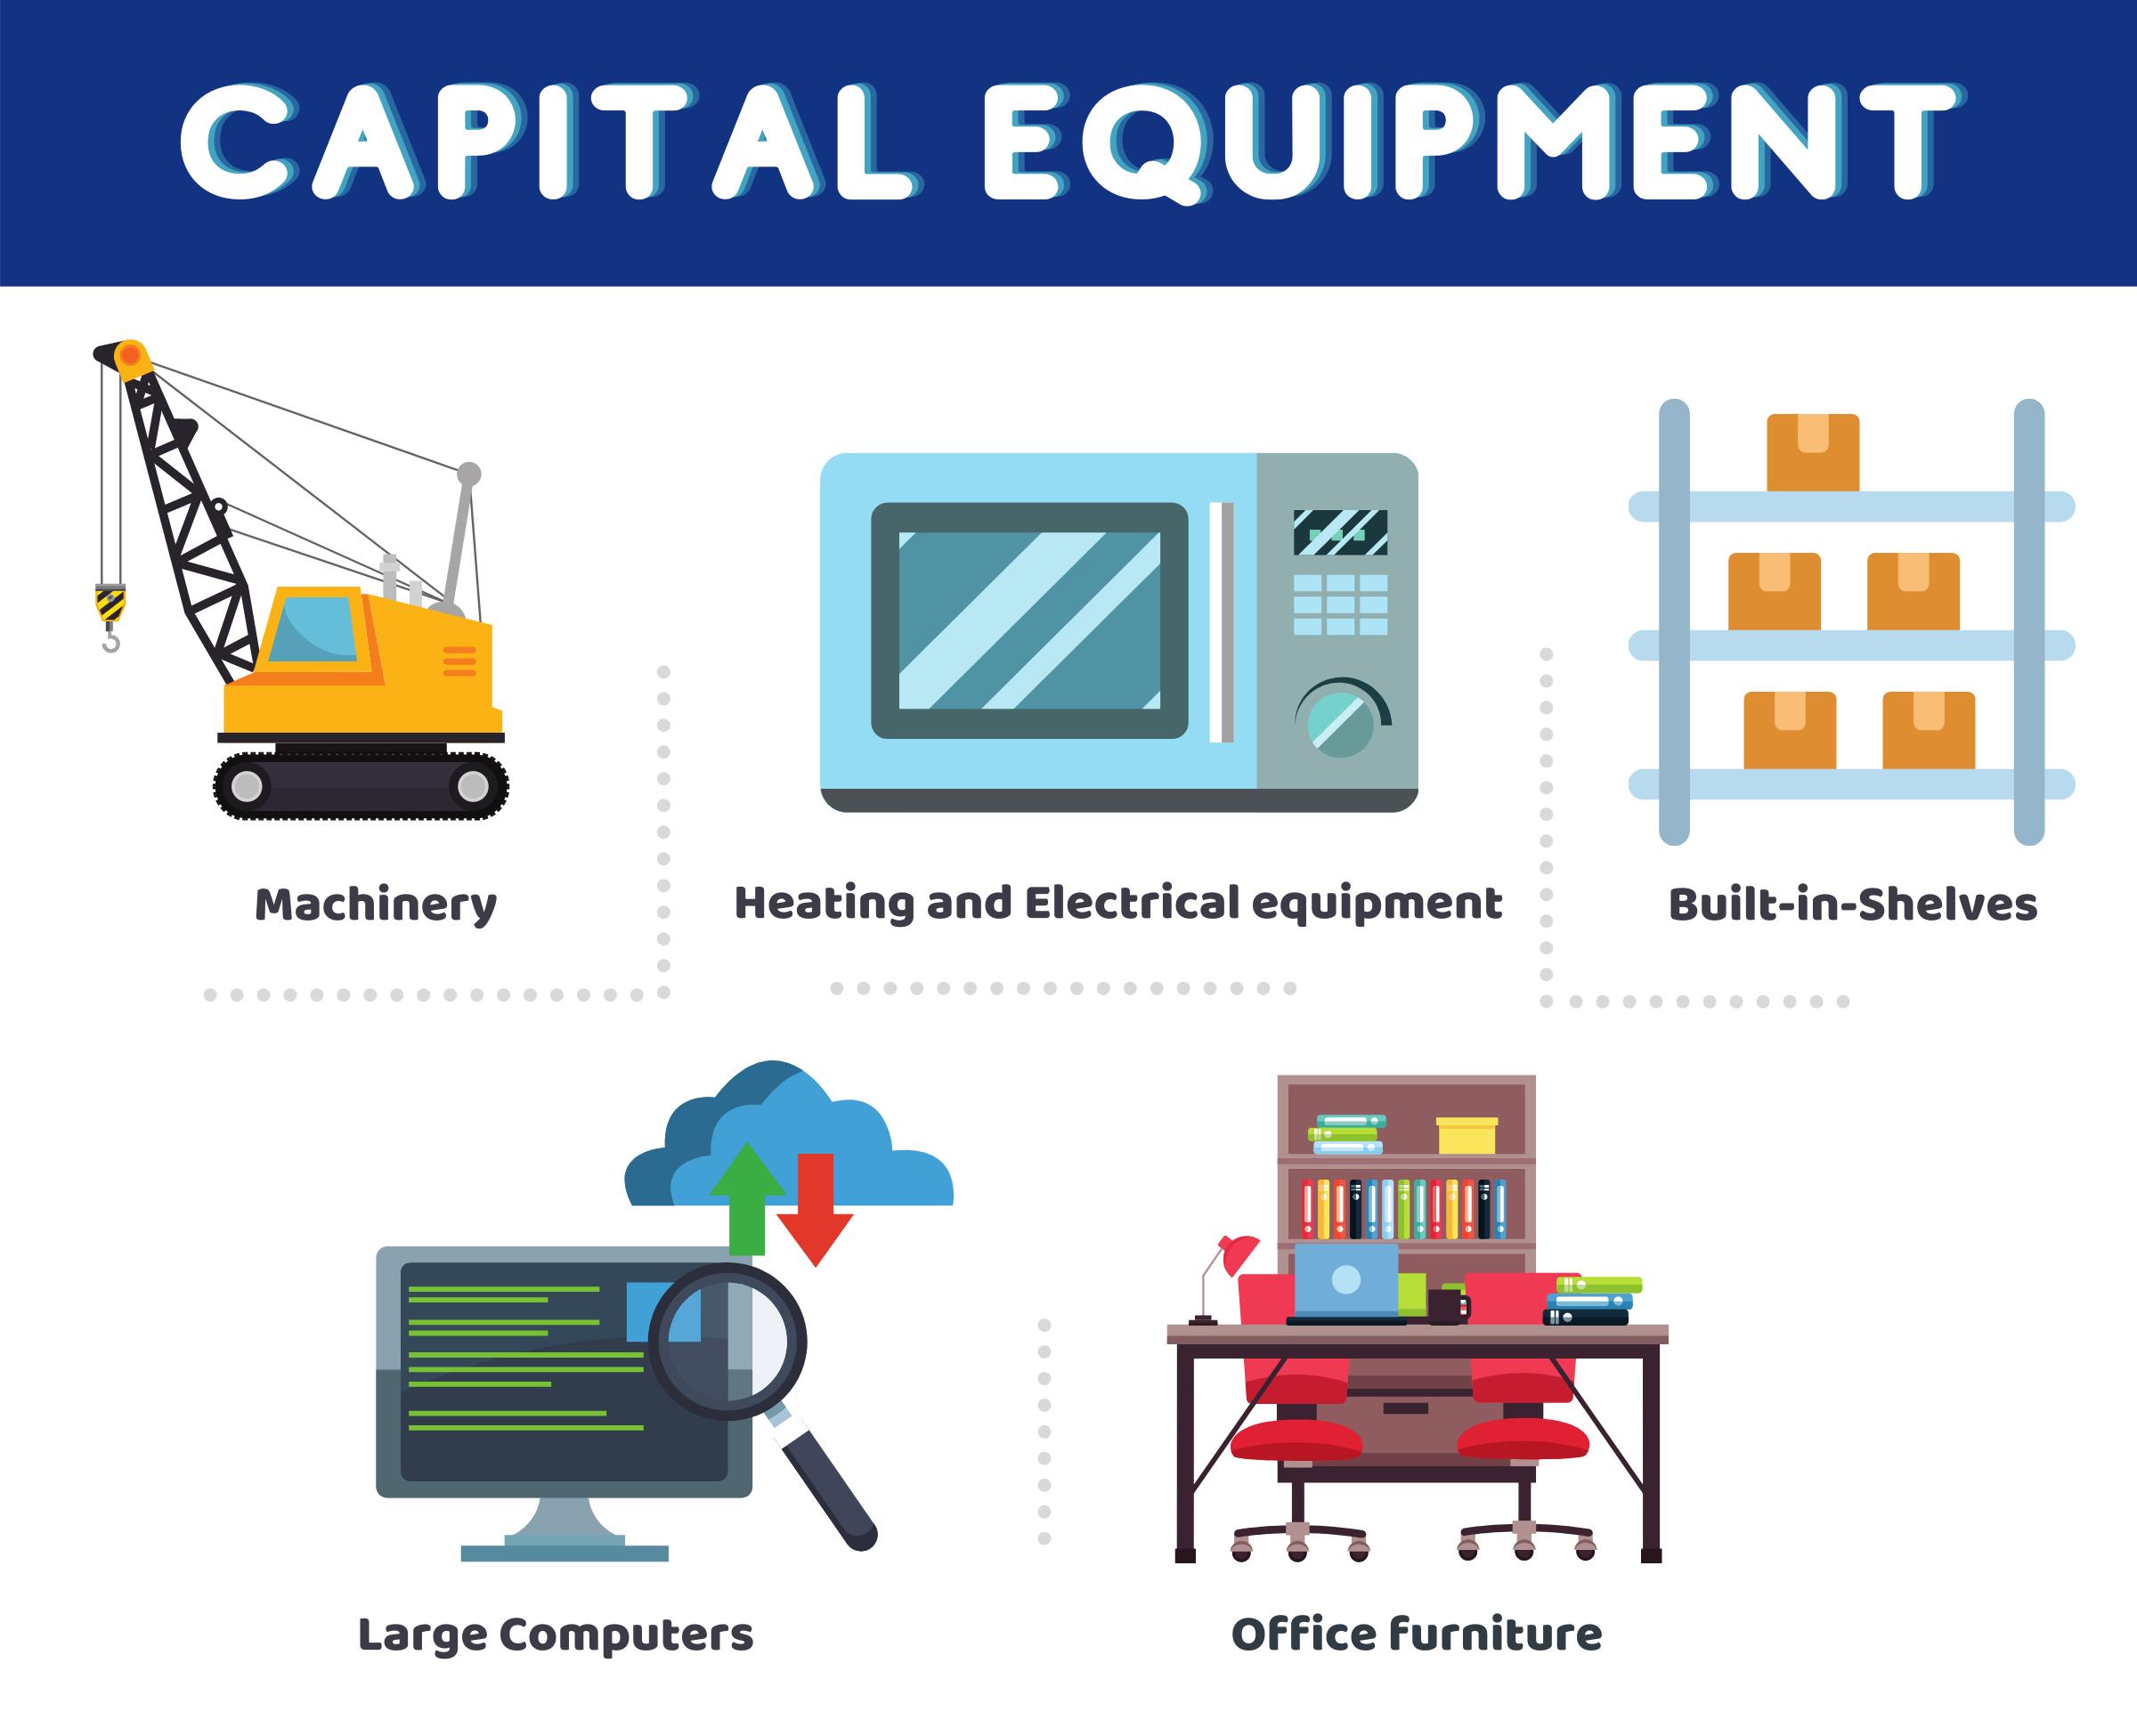 Types of Capital Equipment